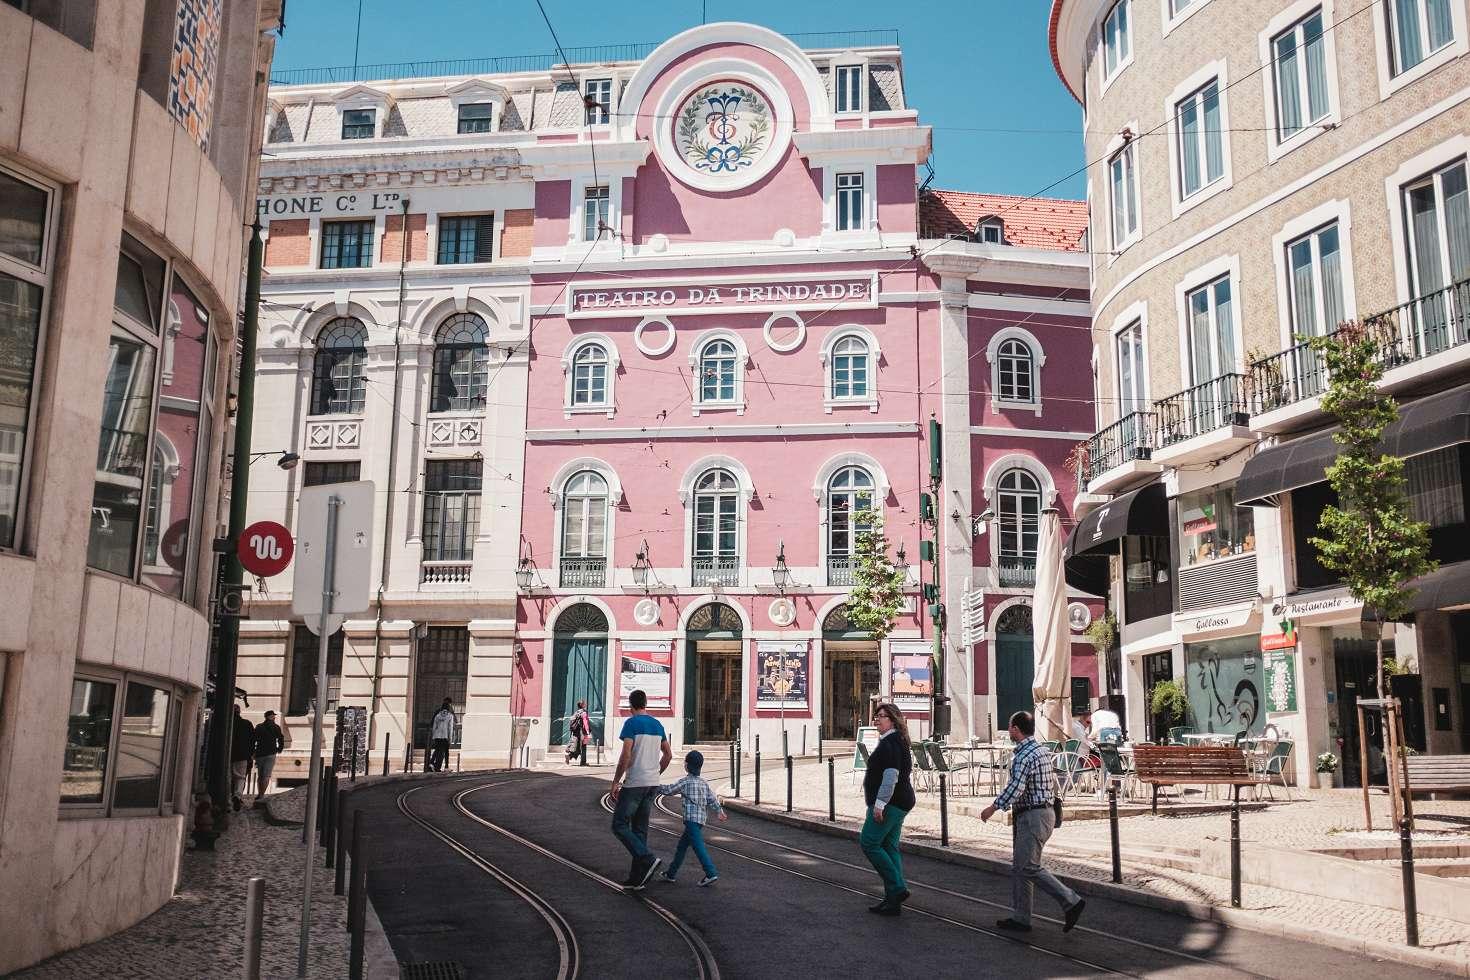 Valencia-Lissabon-Vigo-Stonehenge (28)